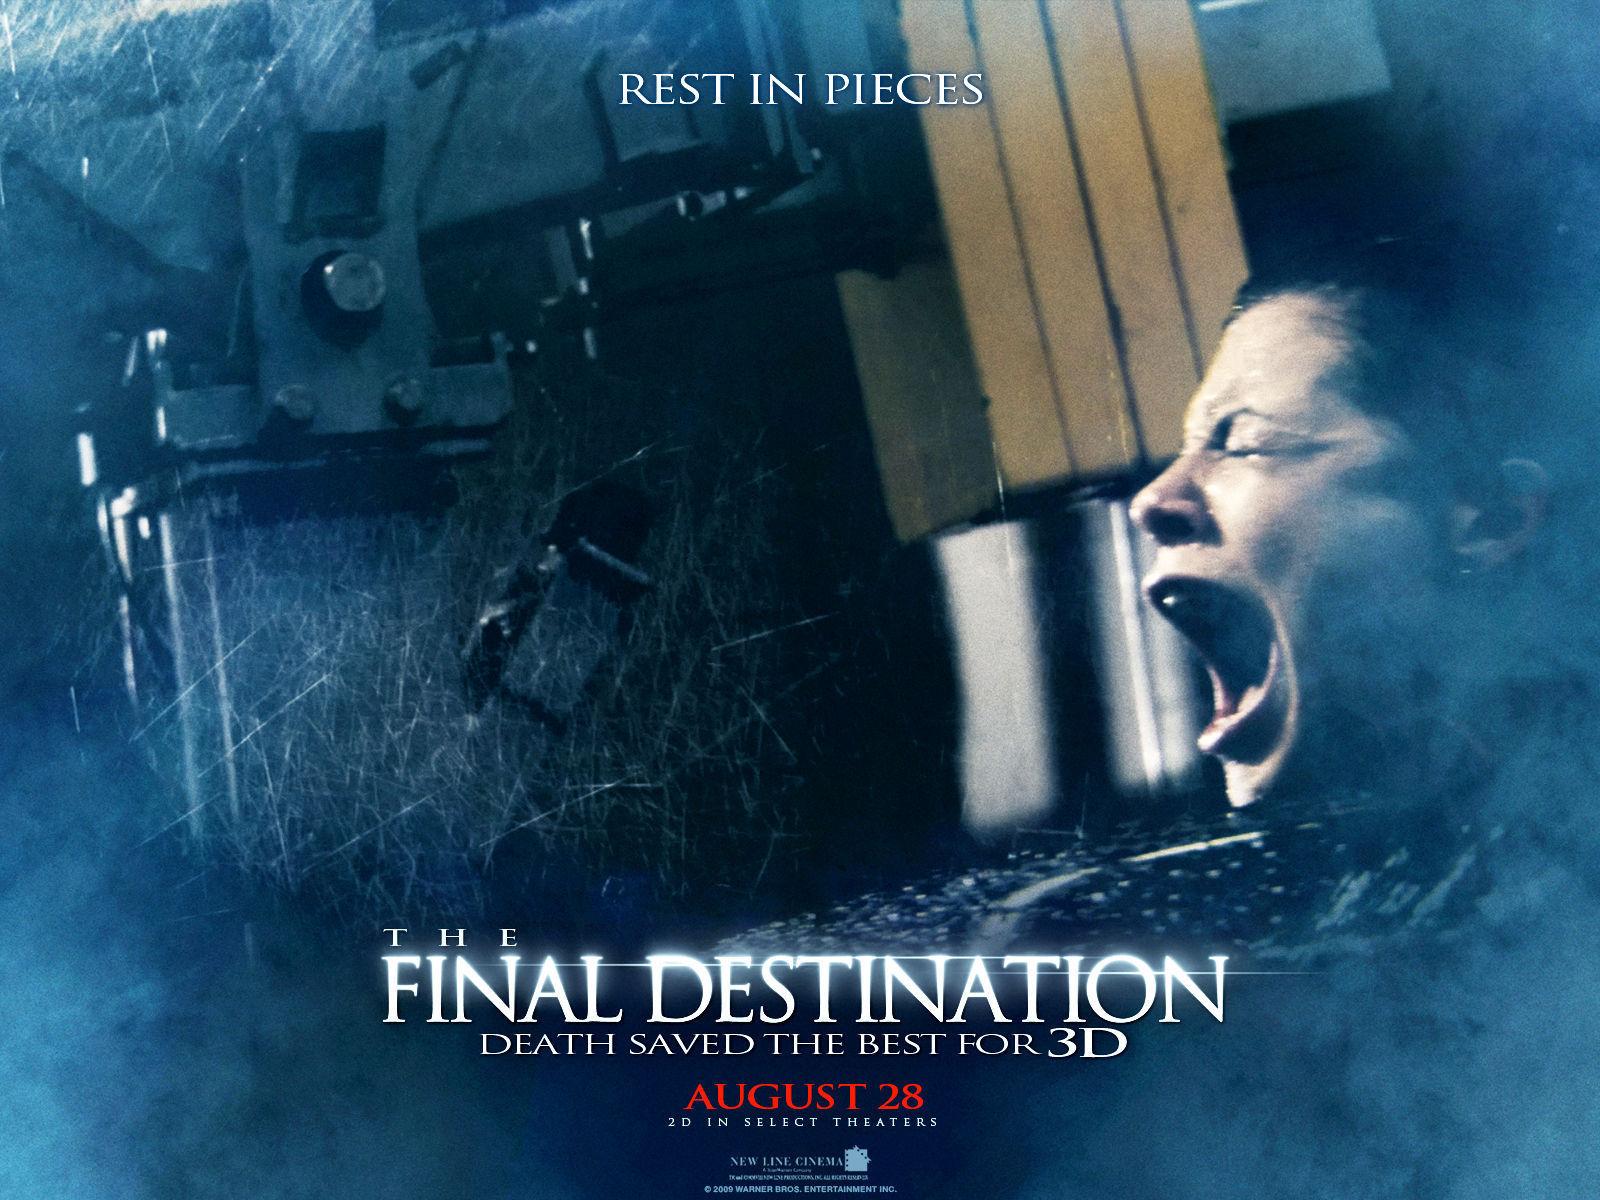 The Final Destination - Upcoming Movies Wallpaper (7691845